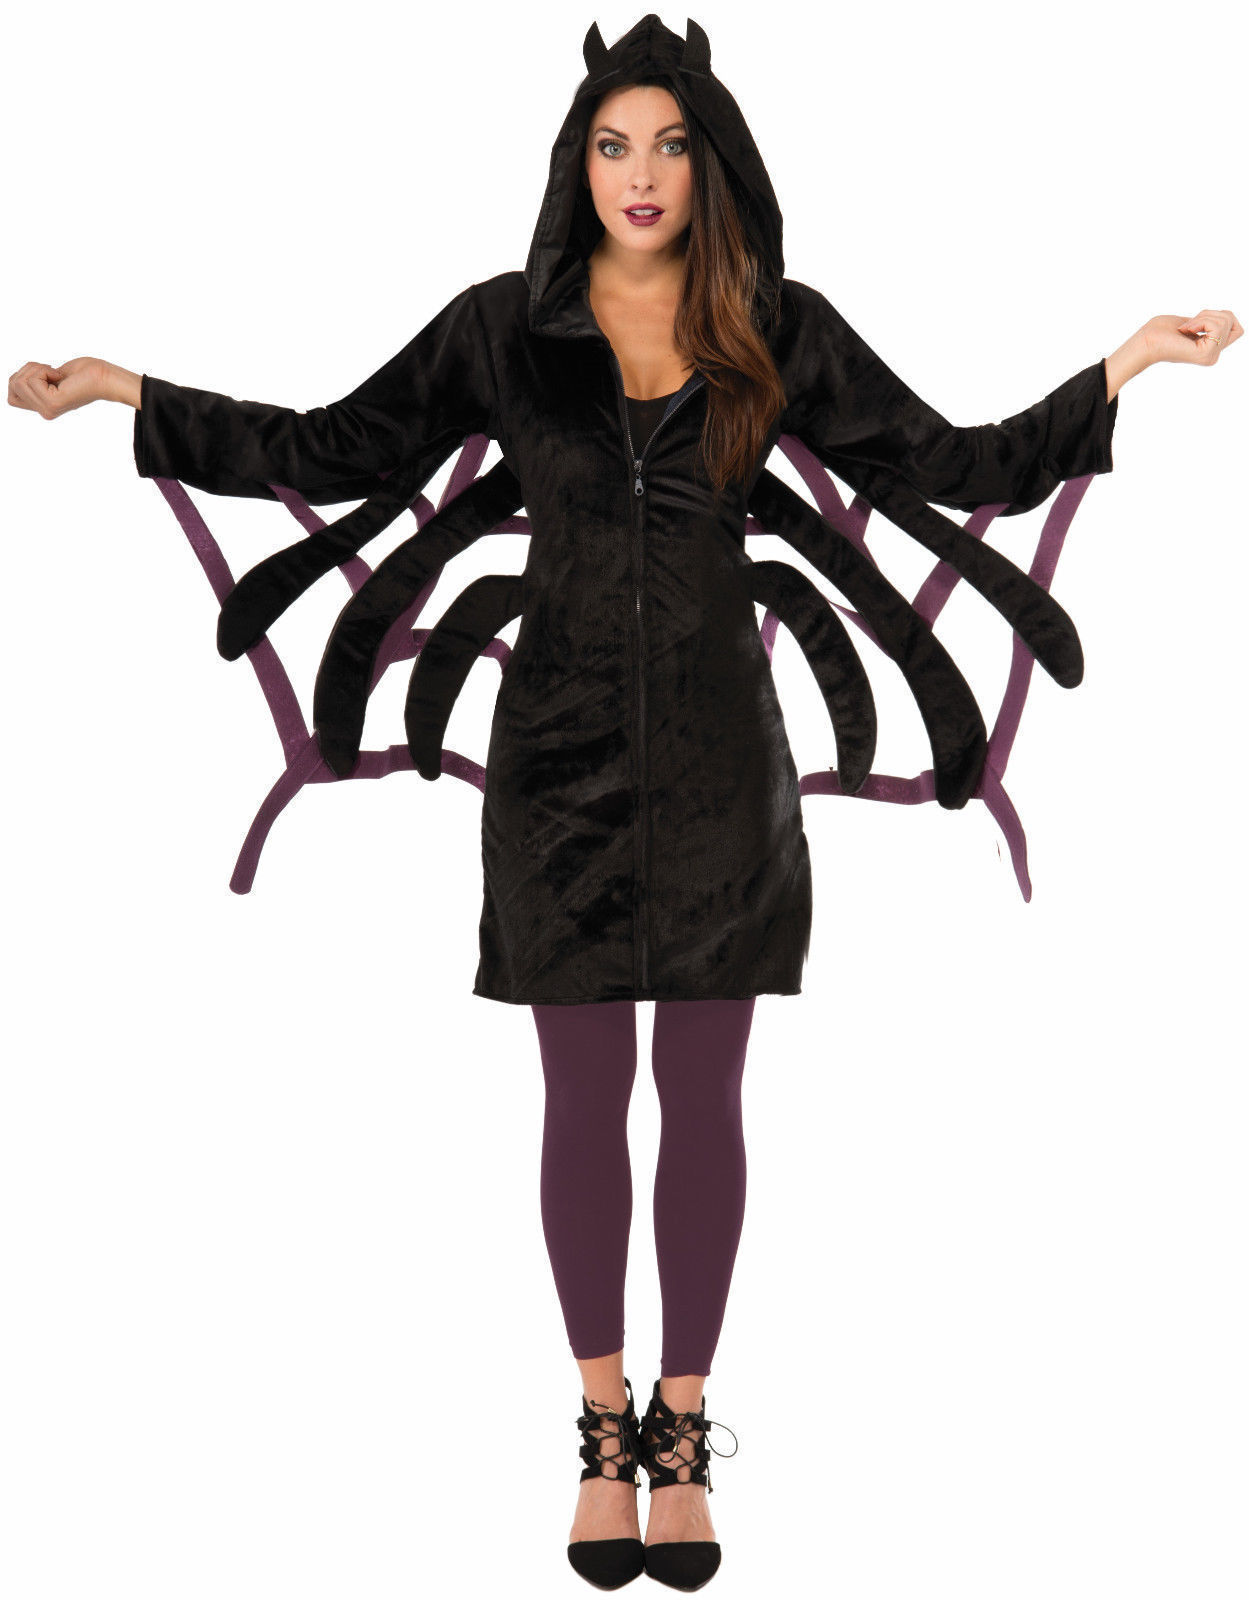 spider hoodie halloween costume adult womens black purple hood